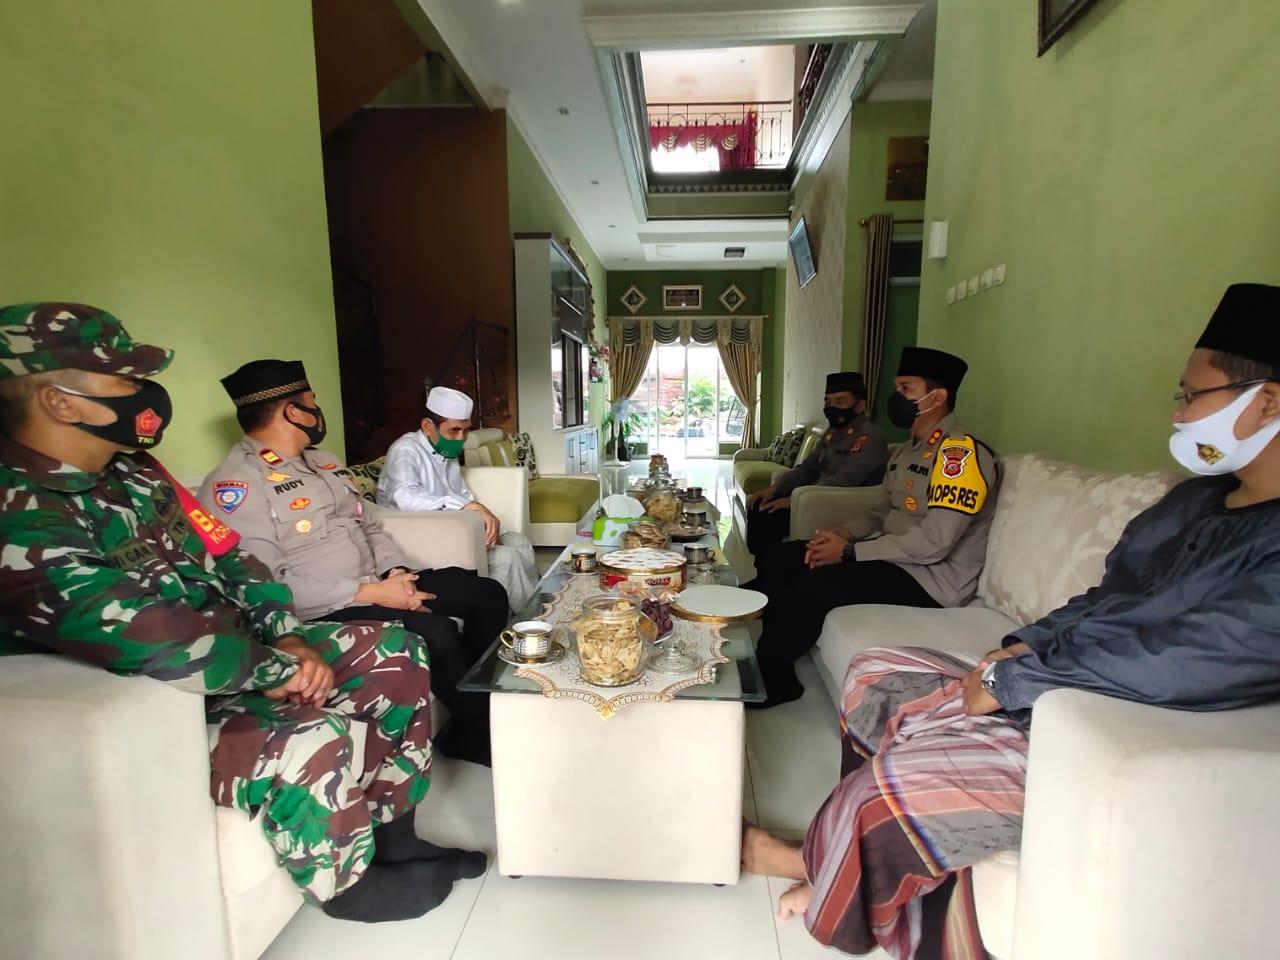 Jalin Kamtibmas, Kapolres Majalengka Edukasikan 3M Ke Ponpes Mursyidul Falah